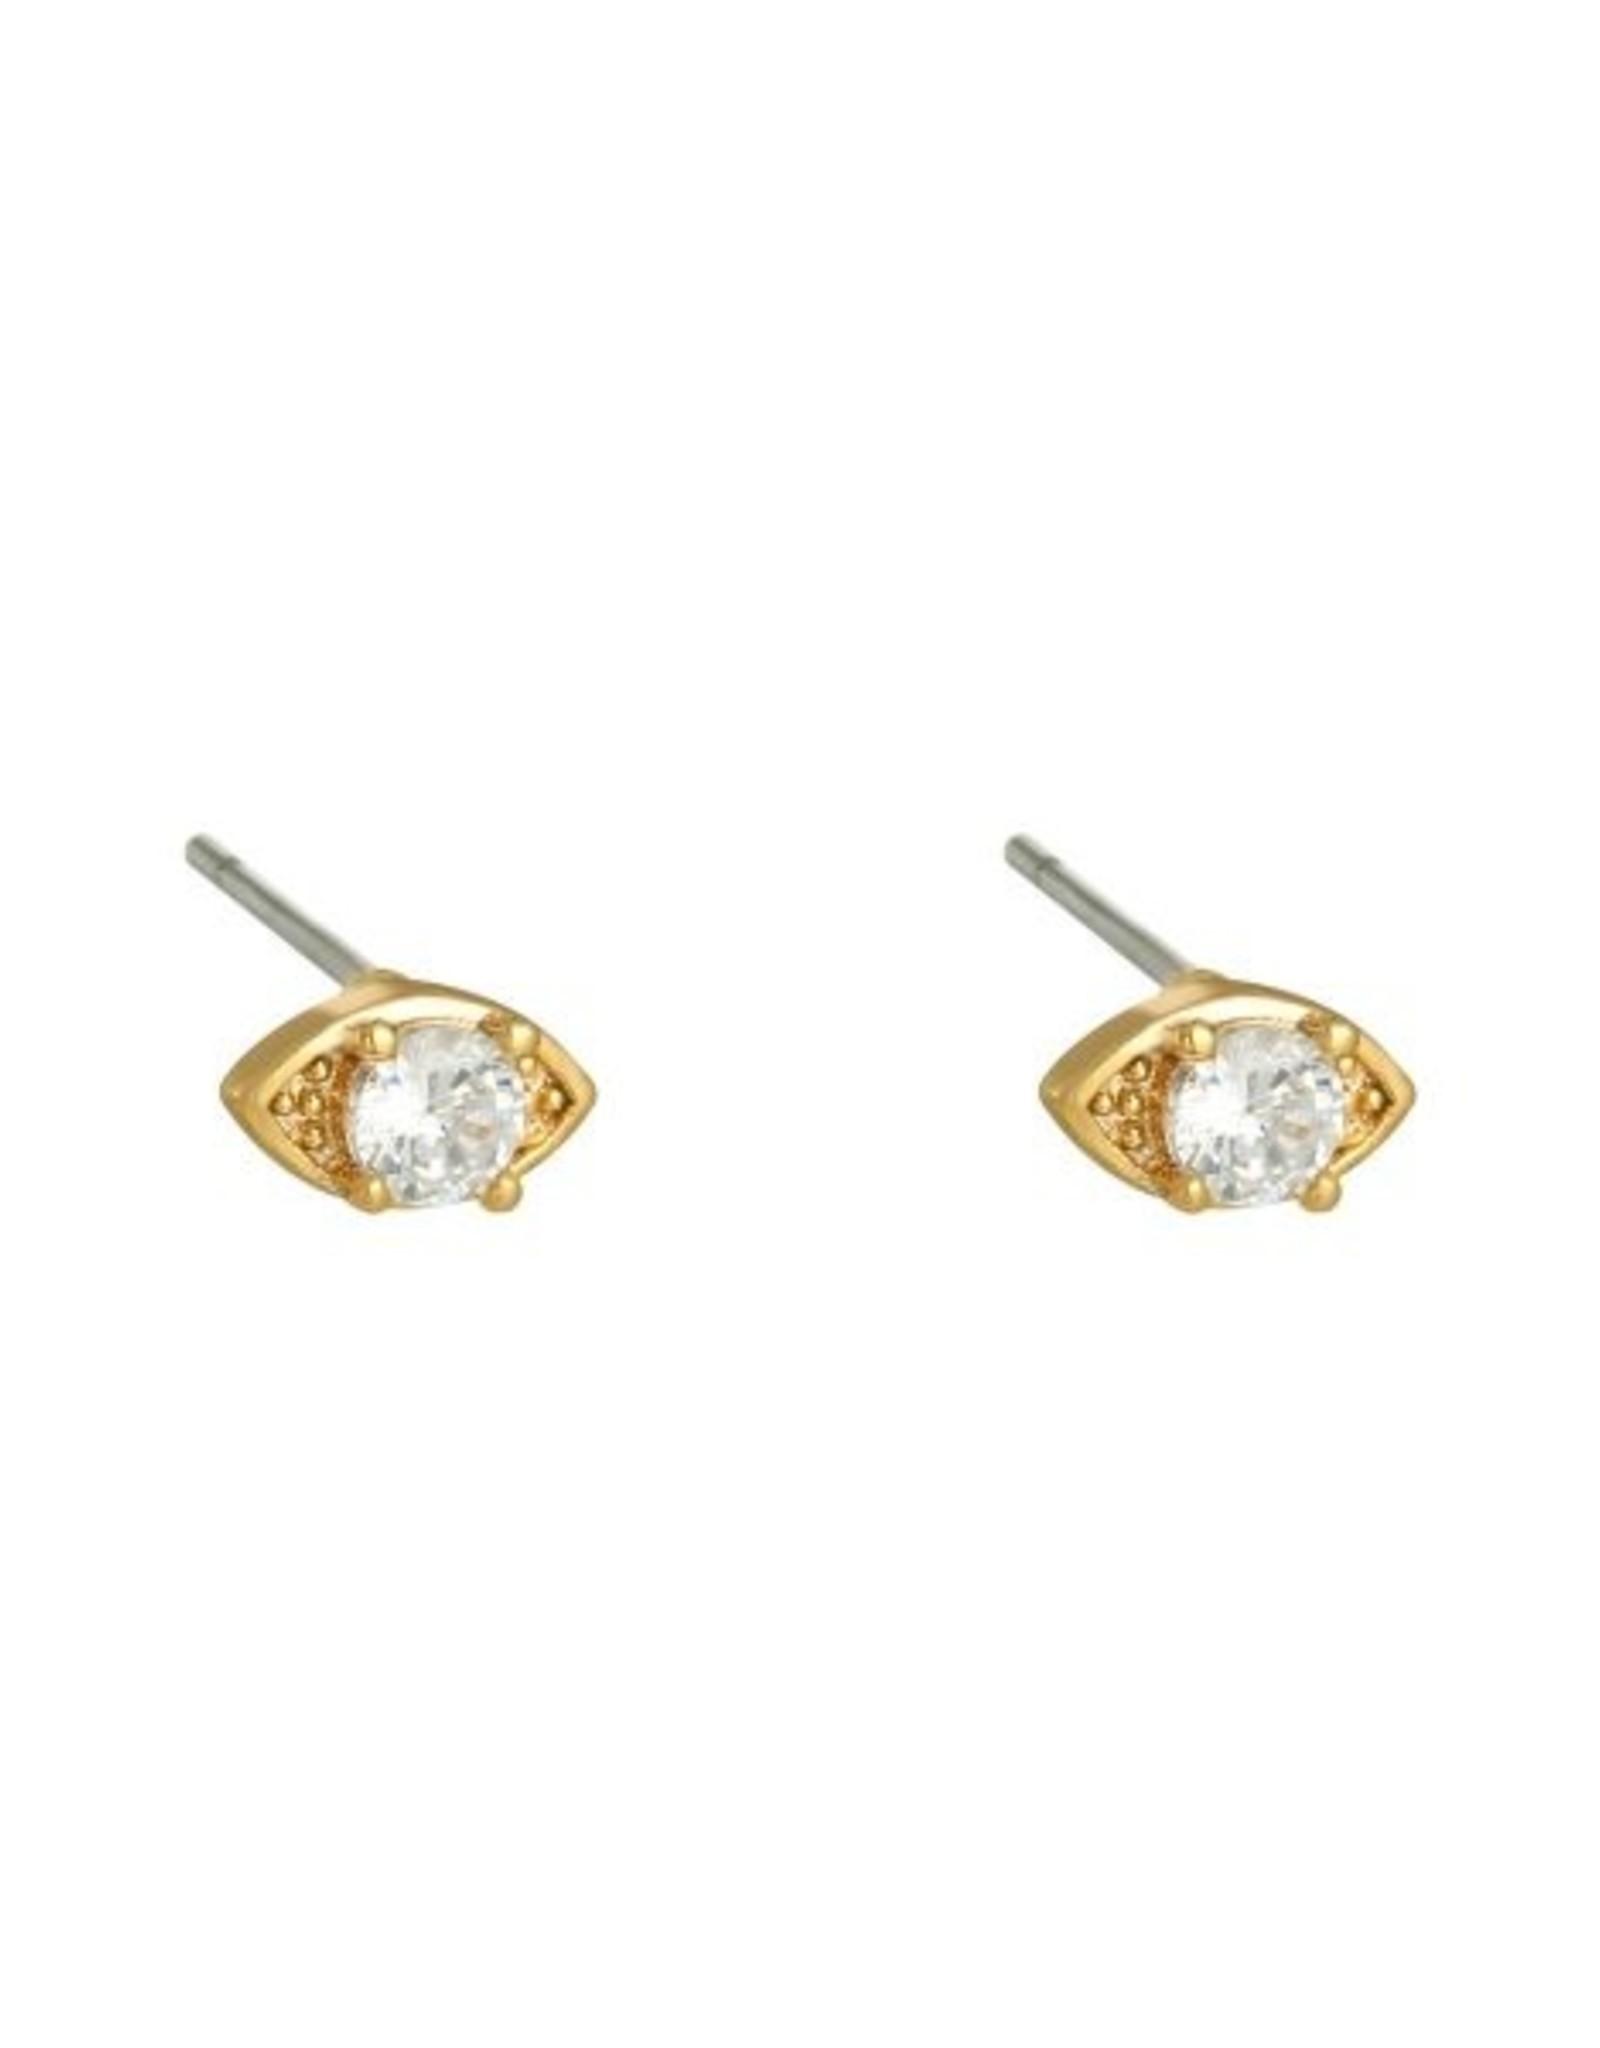 Earrings abstract eye white stone